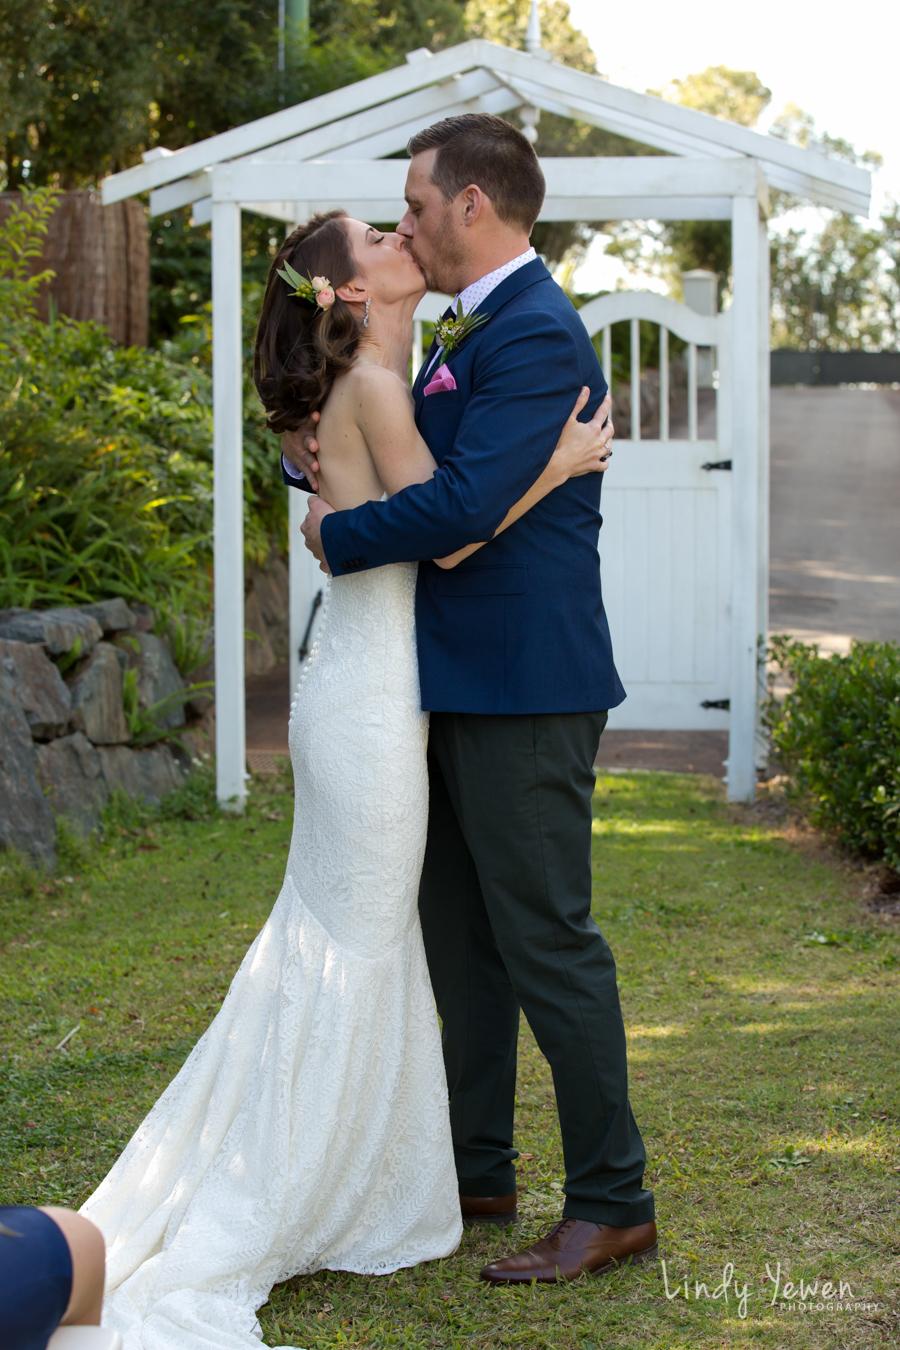 Montville-wedding-photographer-Lauren-Kirby 123.jpg